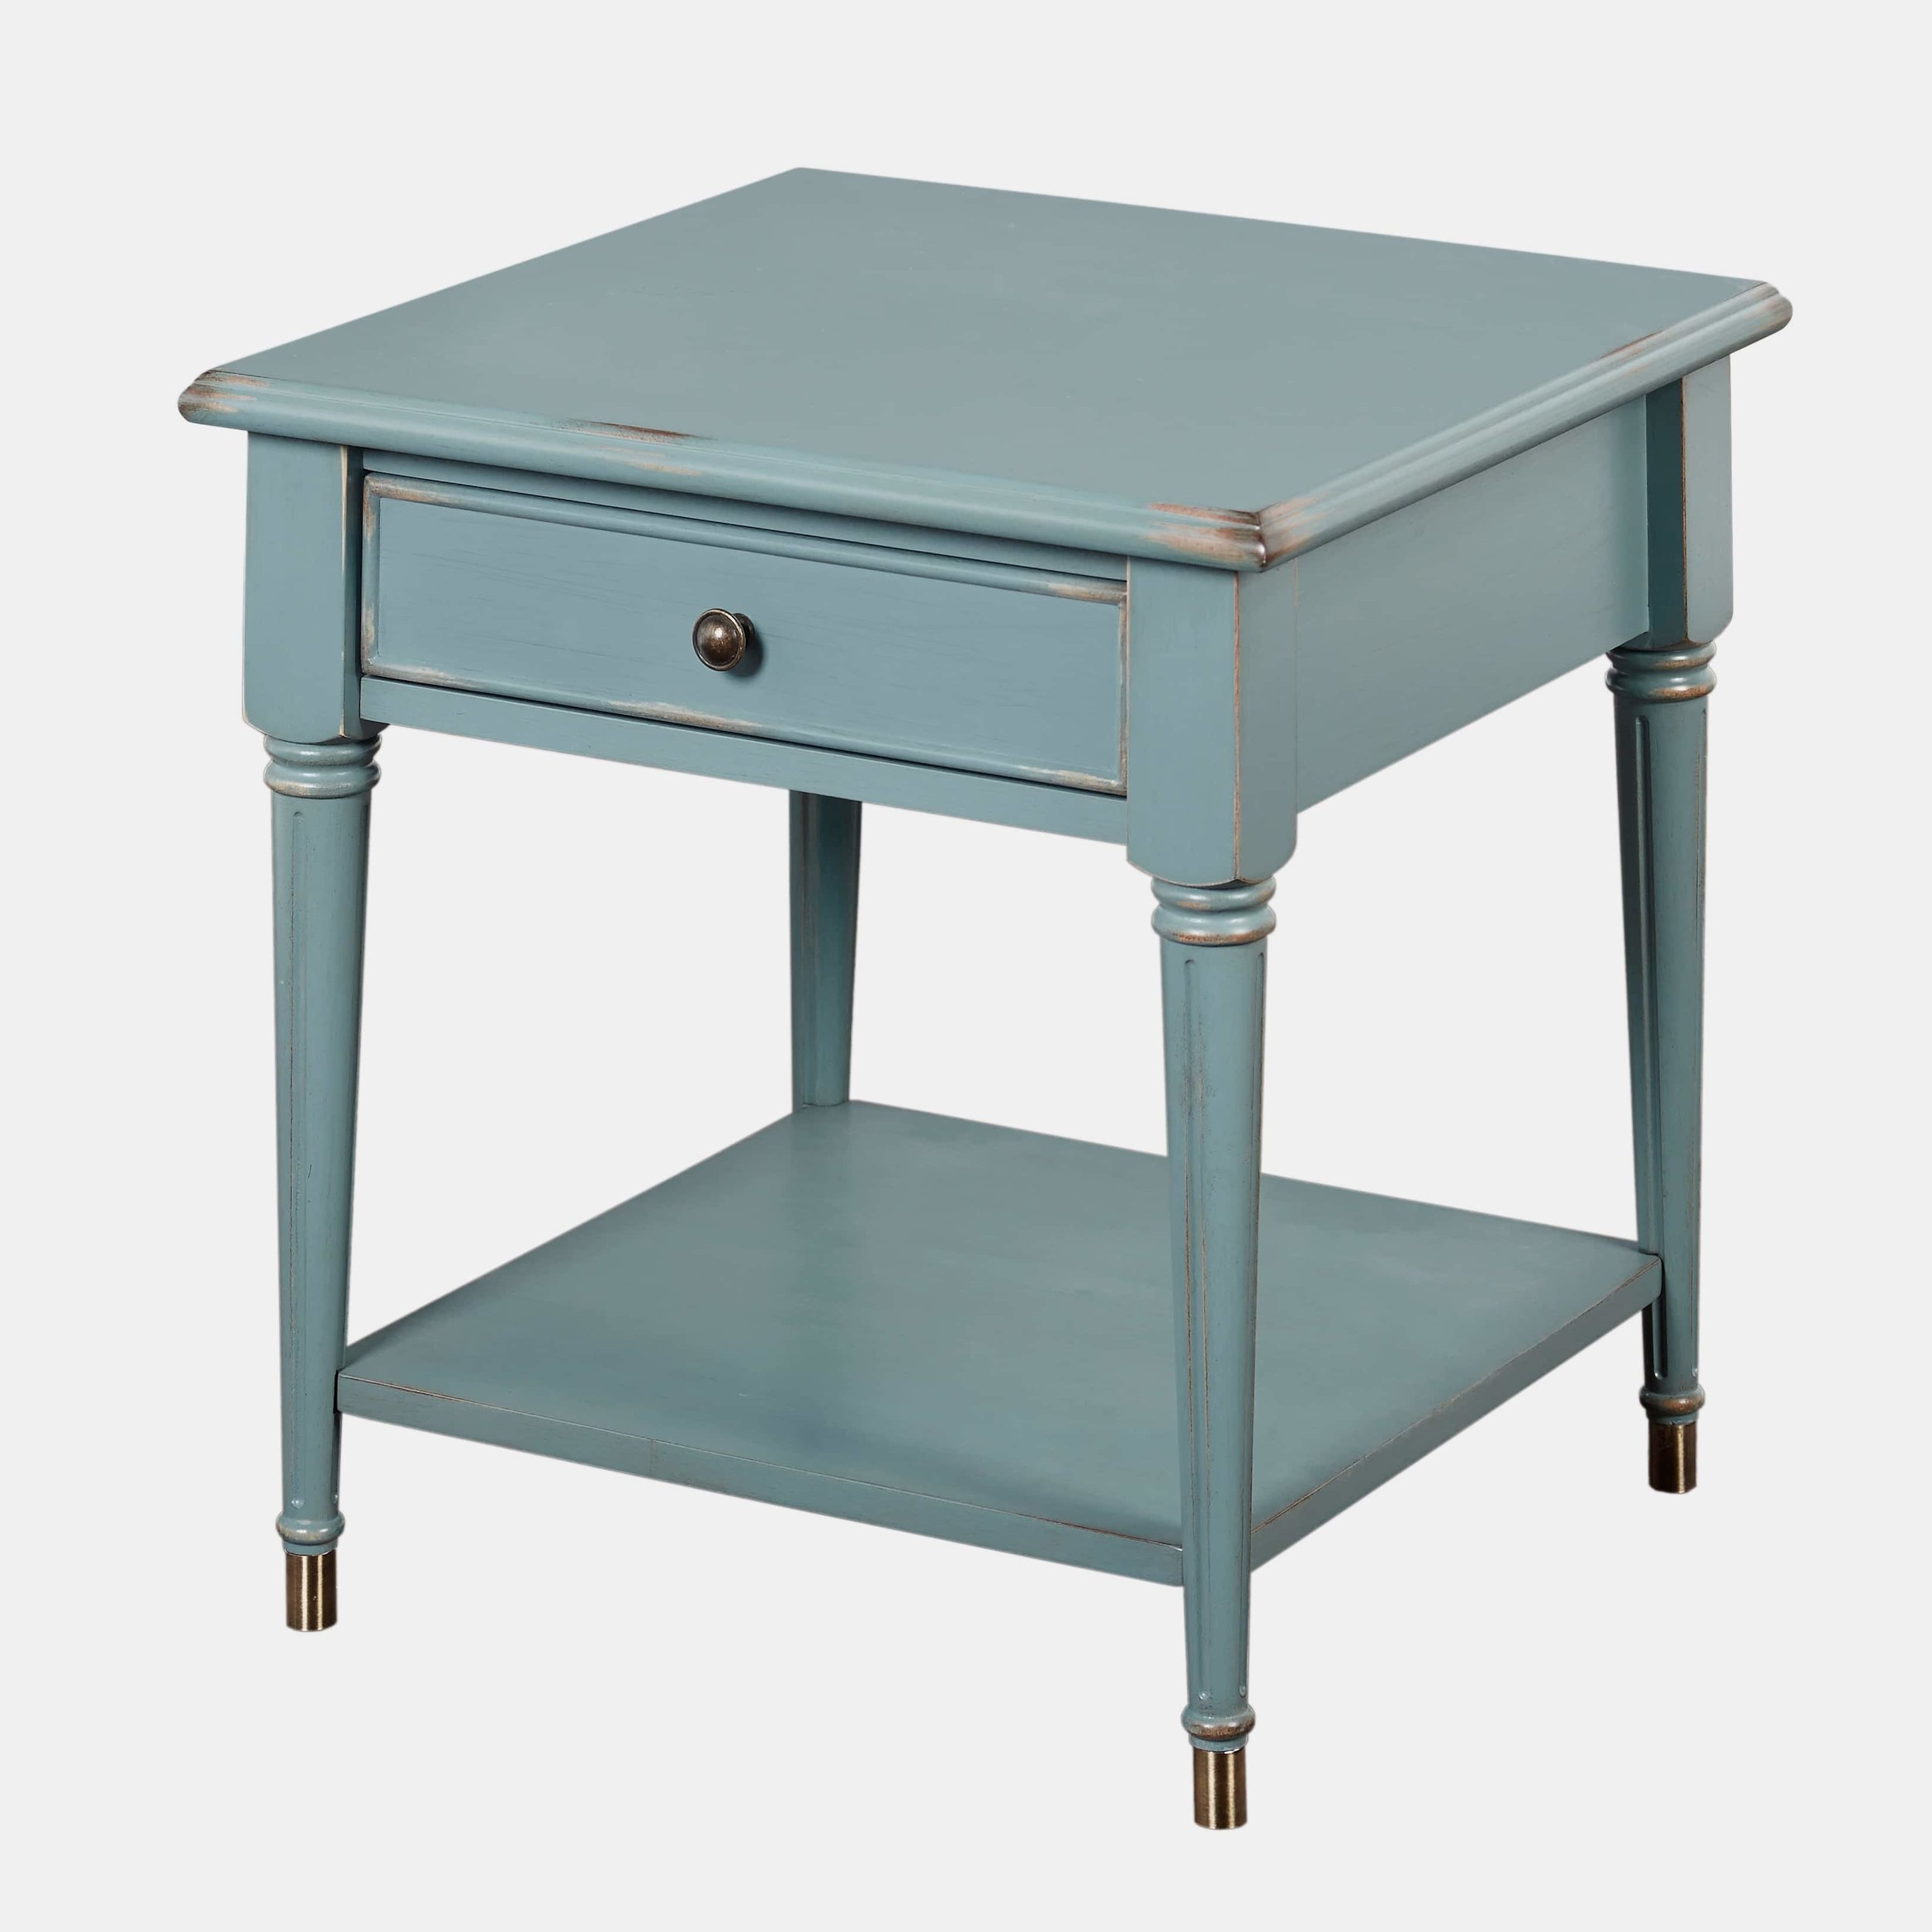 Simple-Living-Emilia-Antique-blue-Finish-End-Table-0c7f7bc1-6a9f-4532-96d2-93d9e45a52ba.jpg